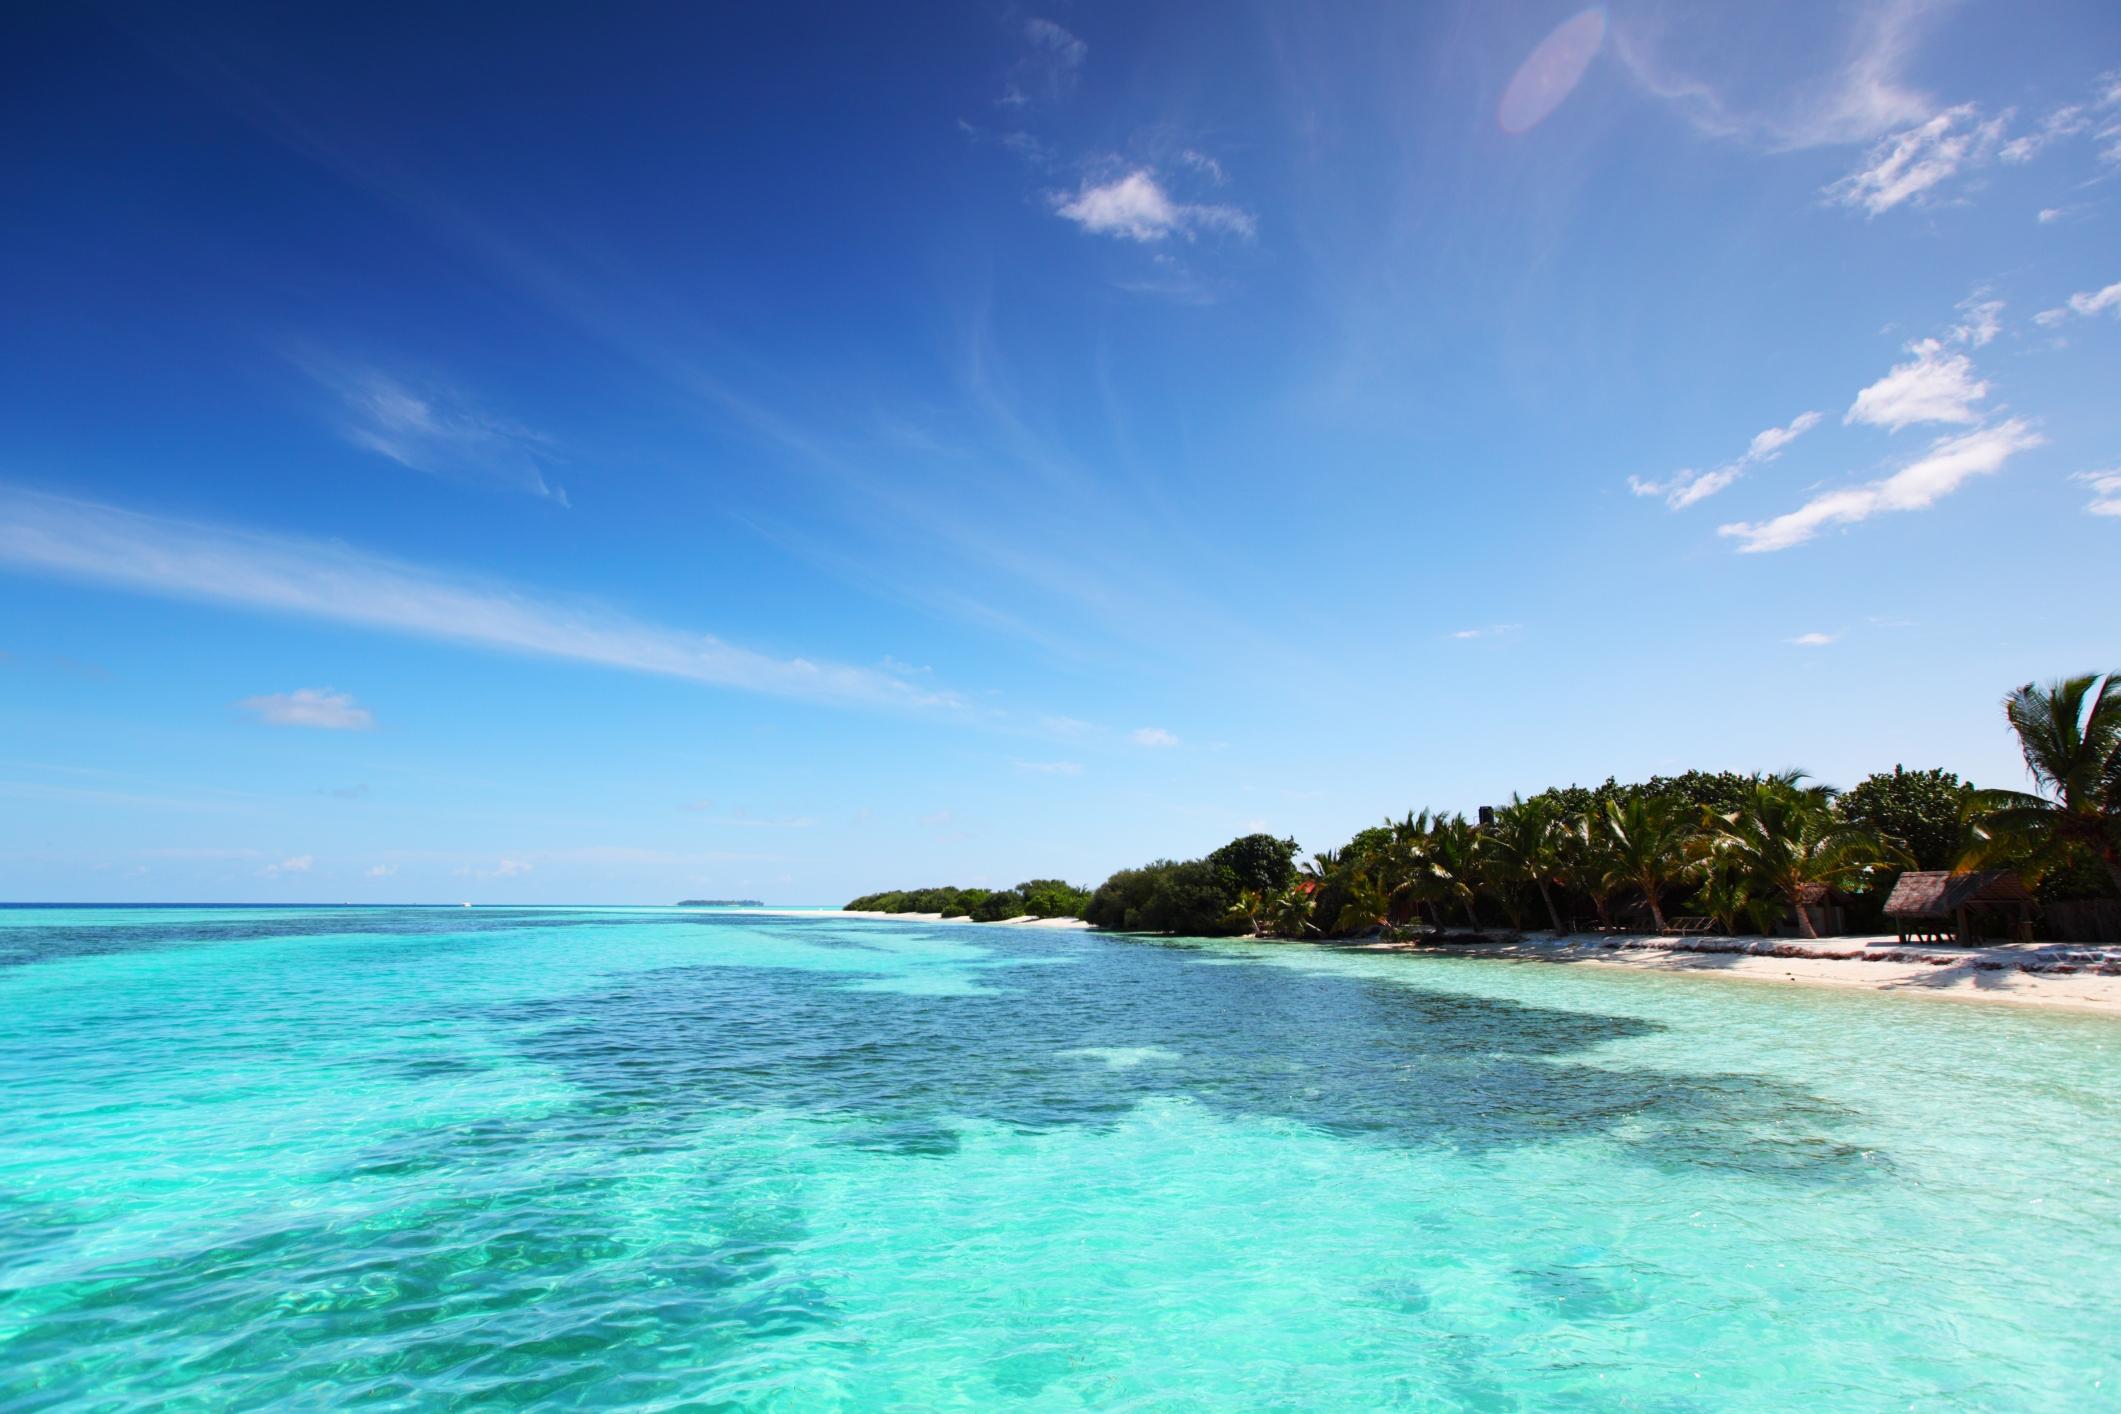 Sky Scanner 9 Tage Strandurlaub Gambia Im 3 5 Hotel Inkl Fl 252 Gen